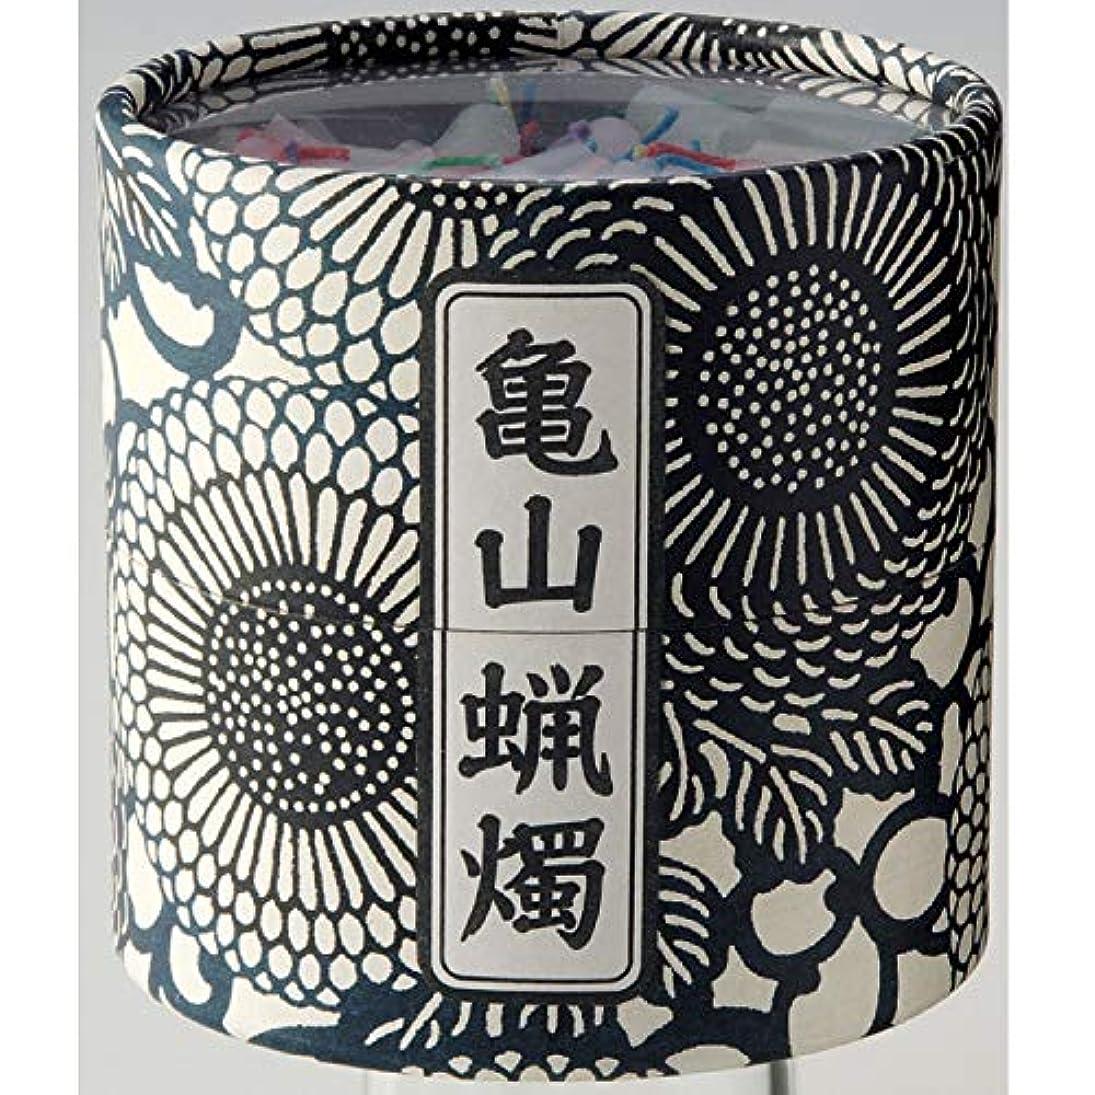 倒錯太字例亀山五色蝋燭(ローソク)約300本入り